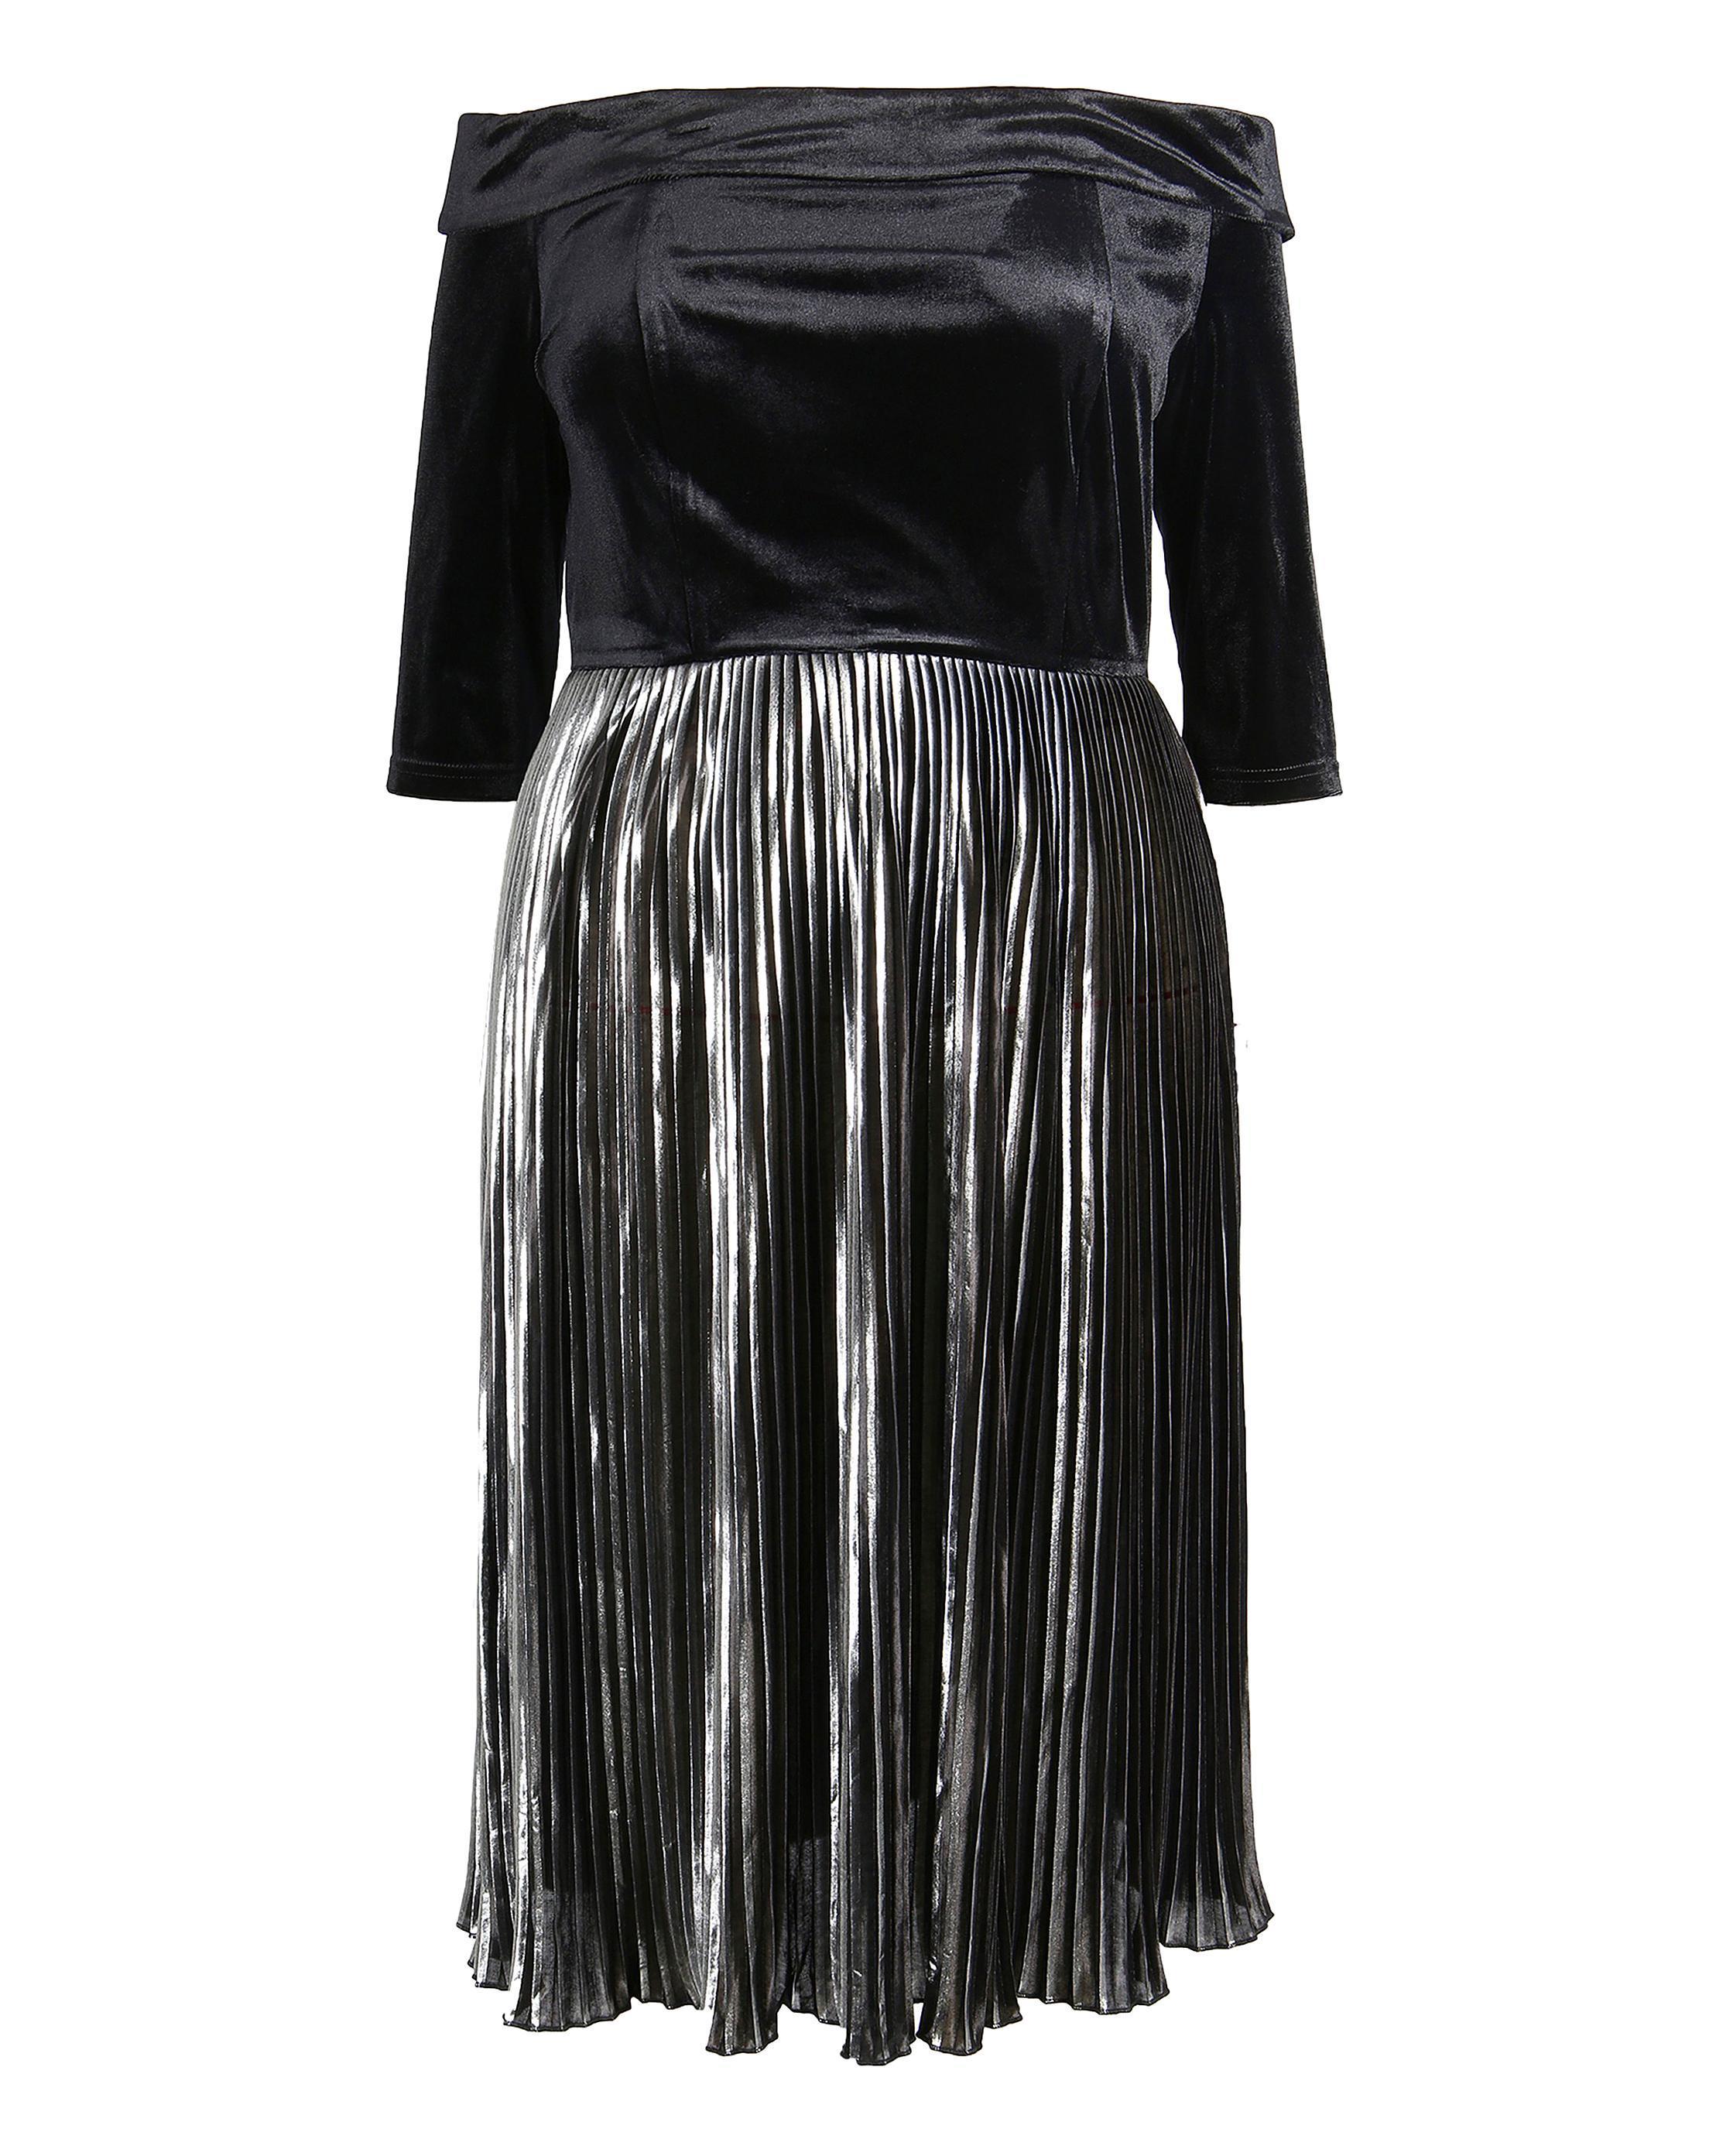 8574578a8de Off The Shoulder Dress Pleated Skirt